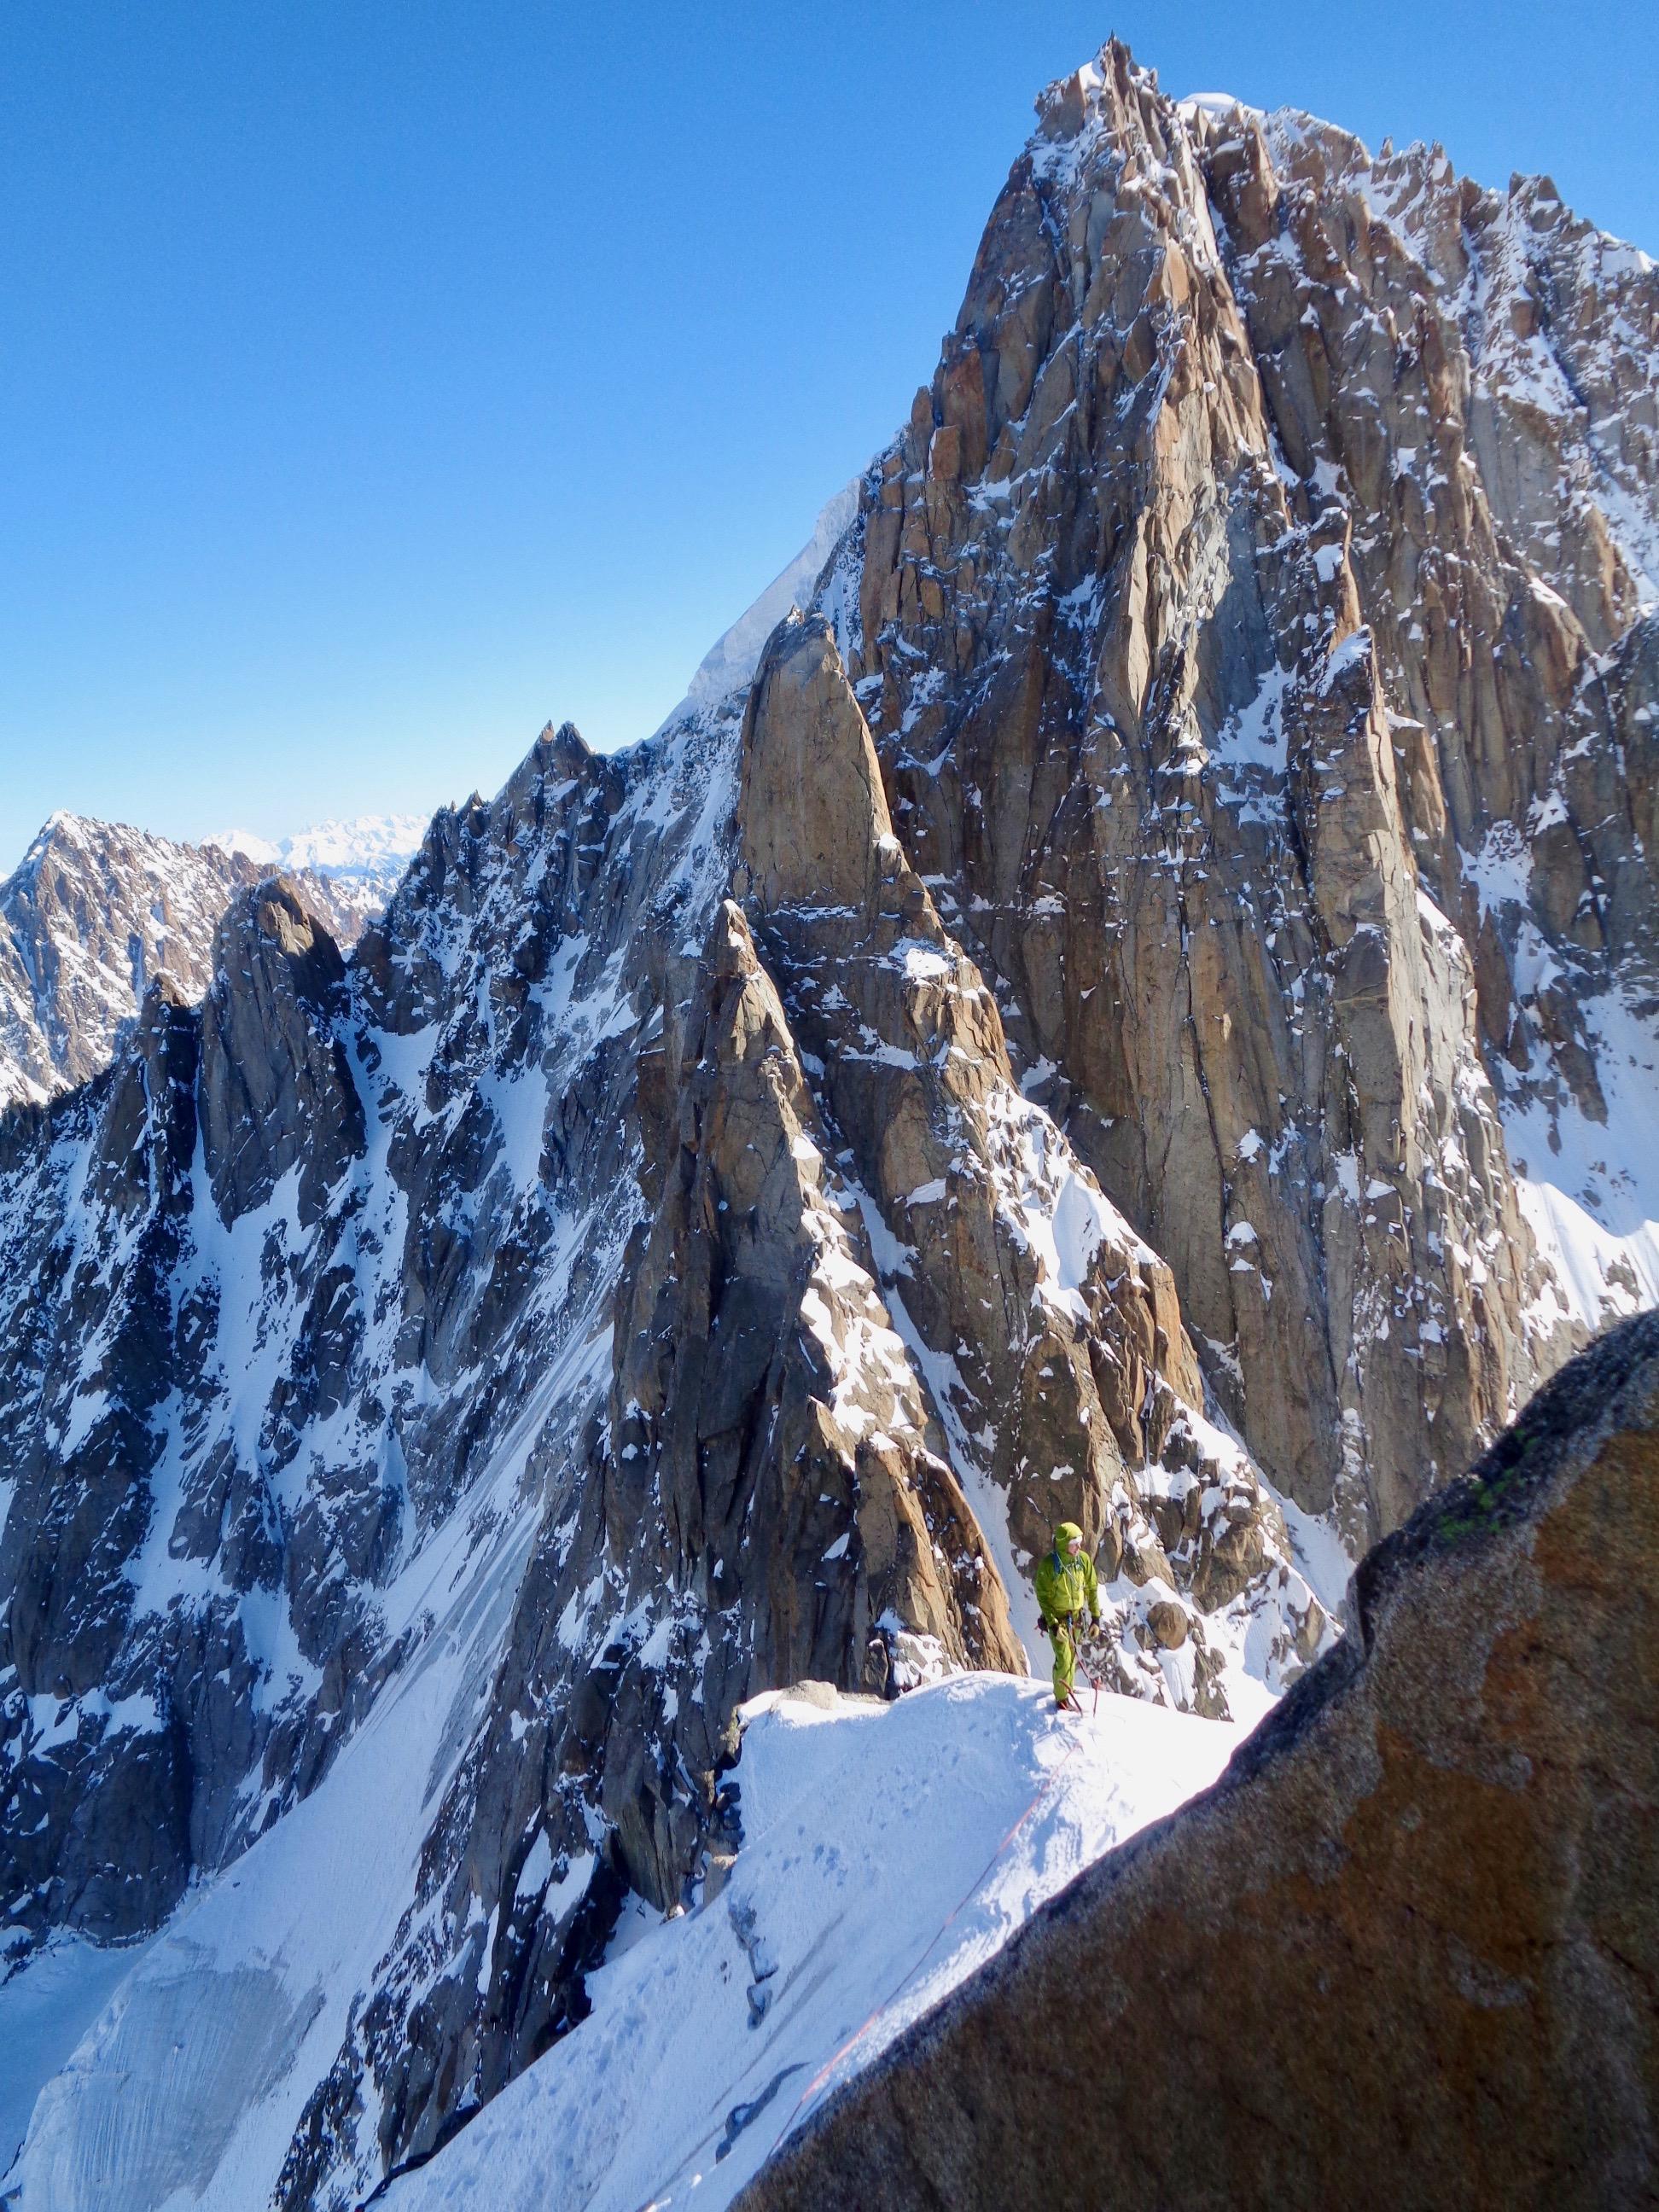 summit ridge of Le grand dru. chamonix. Photo: kim ladiges